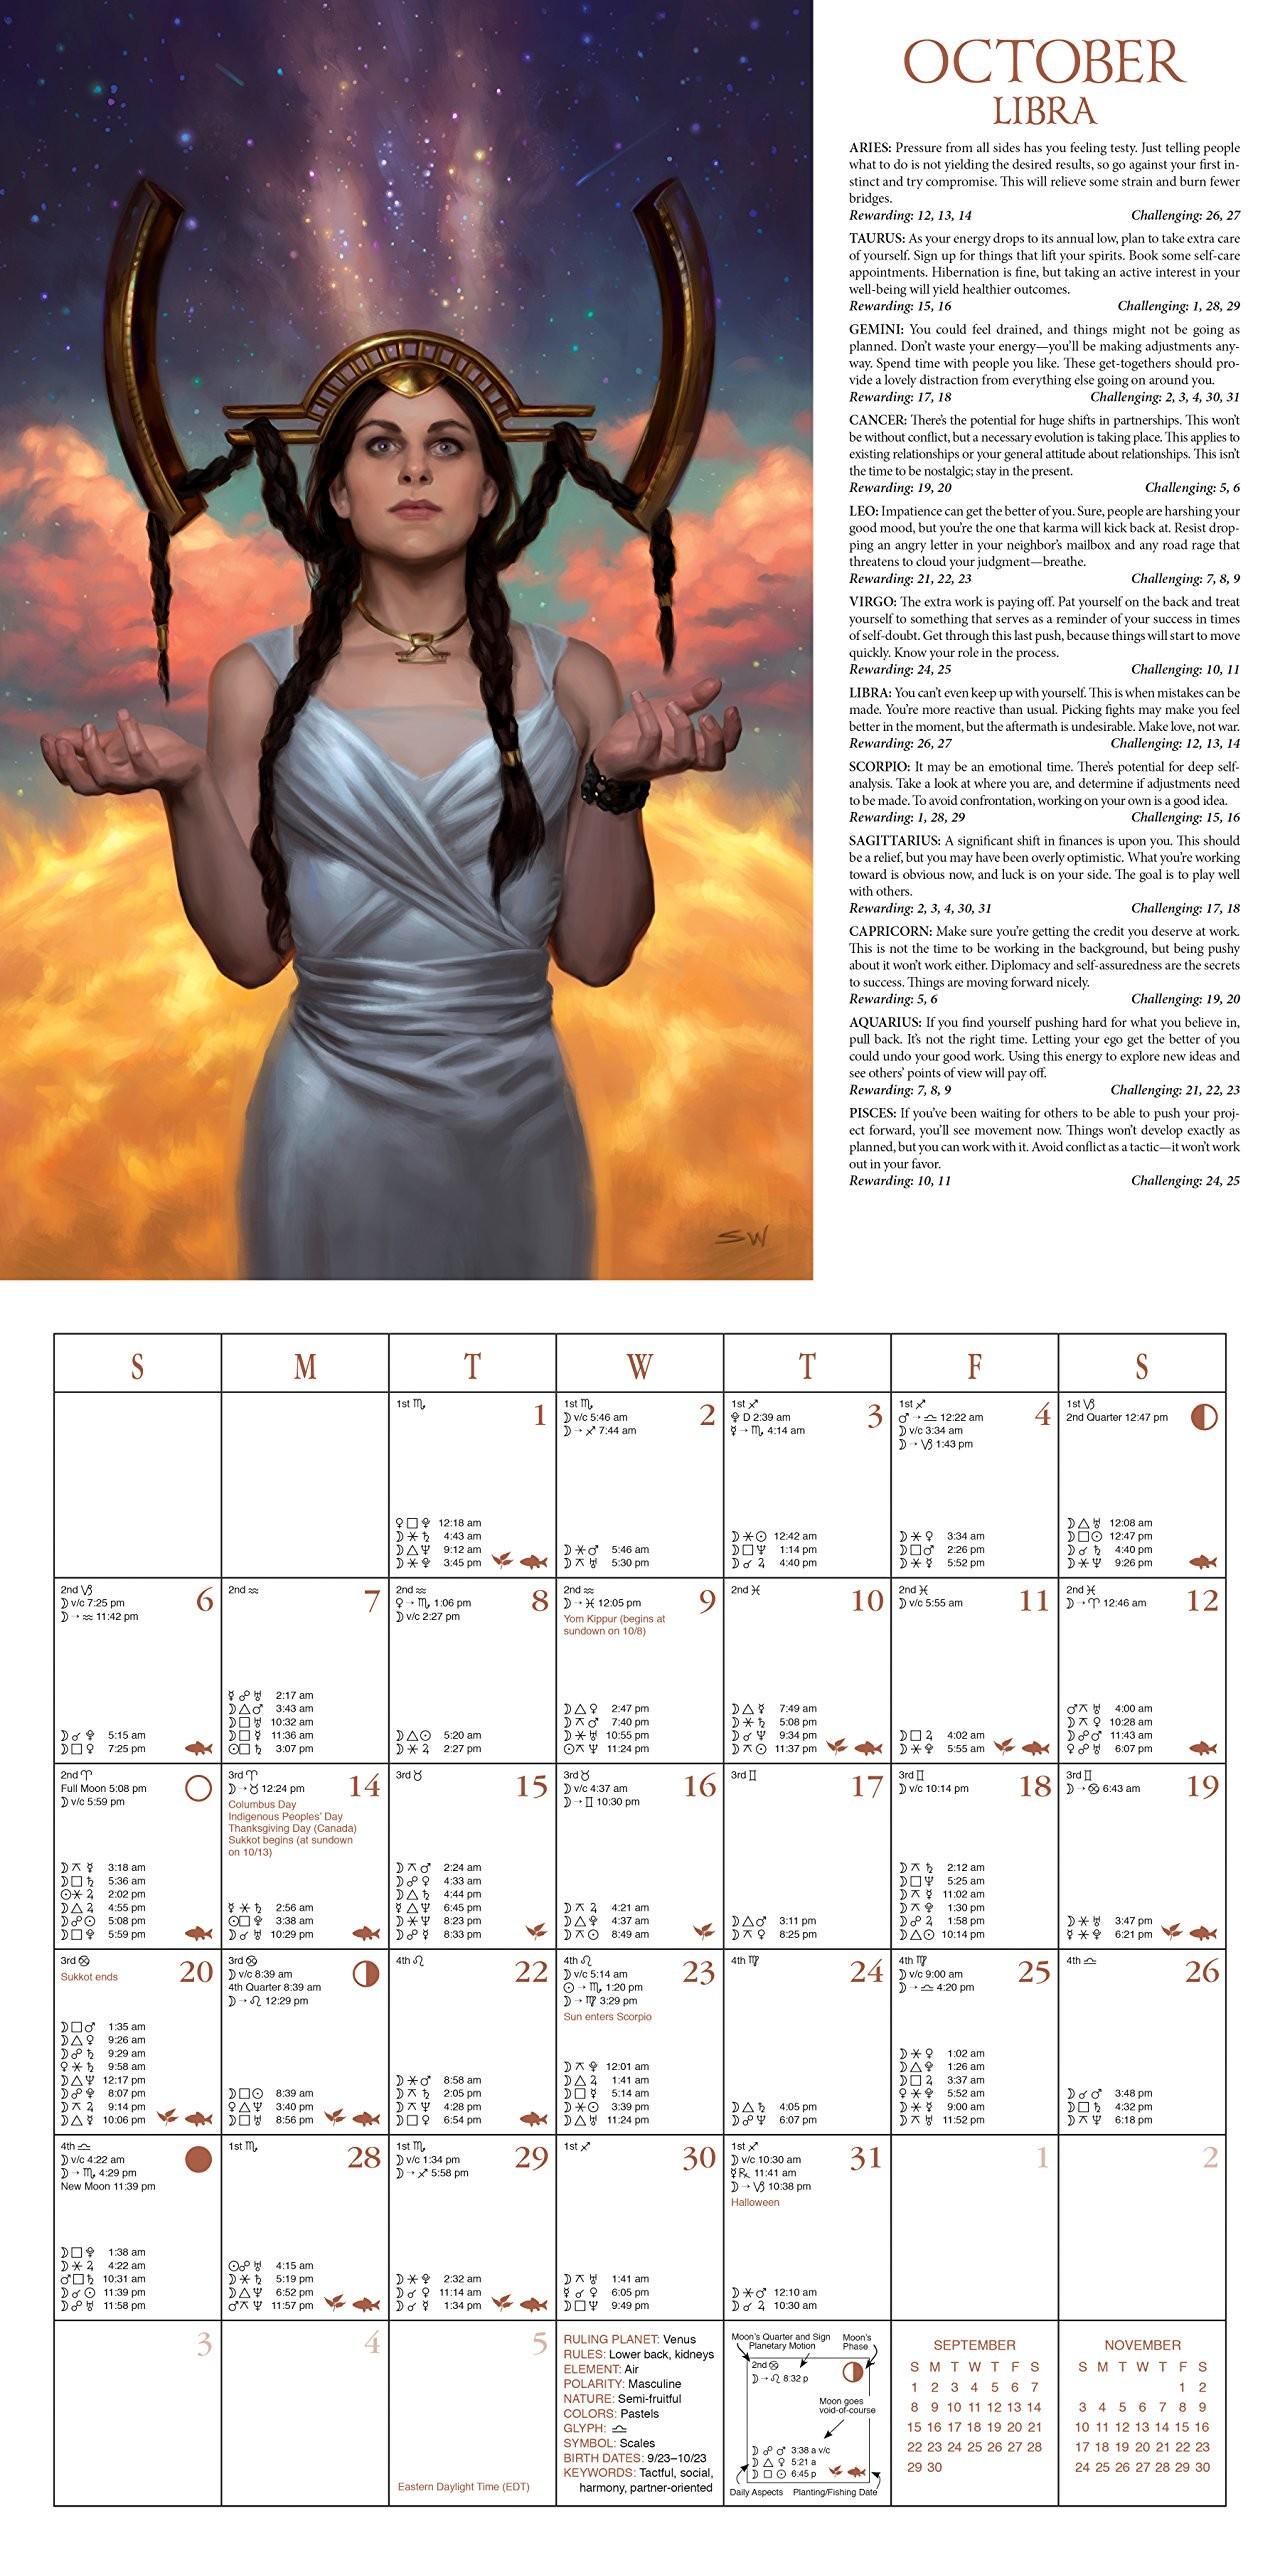 Calendario 2019 Ingles Mejores Y Más Novedosos Llewellyn S 2019 astrological Calendar 86th Edition Of the World S